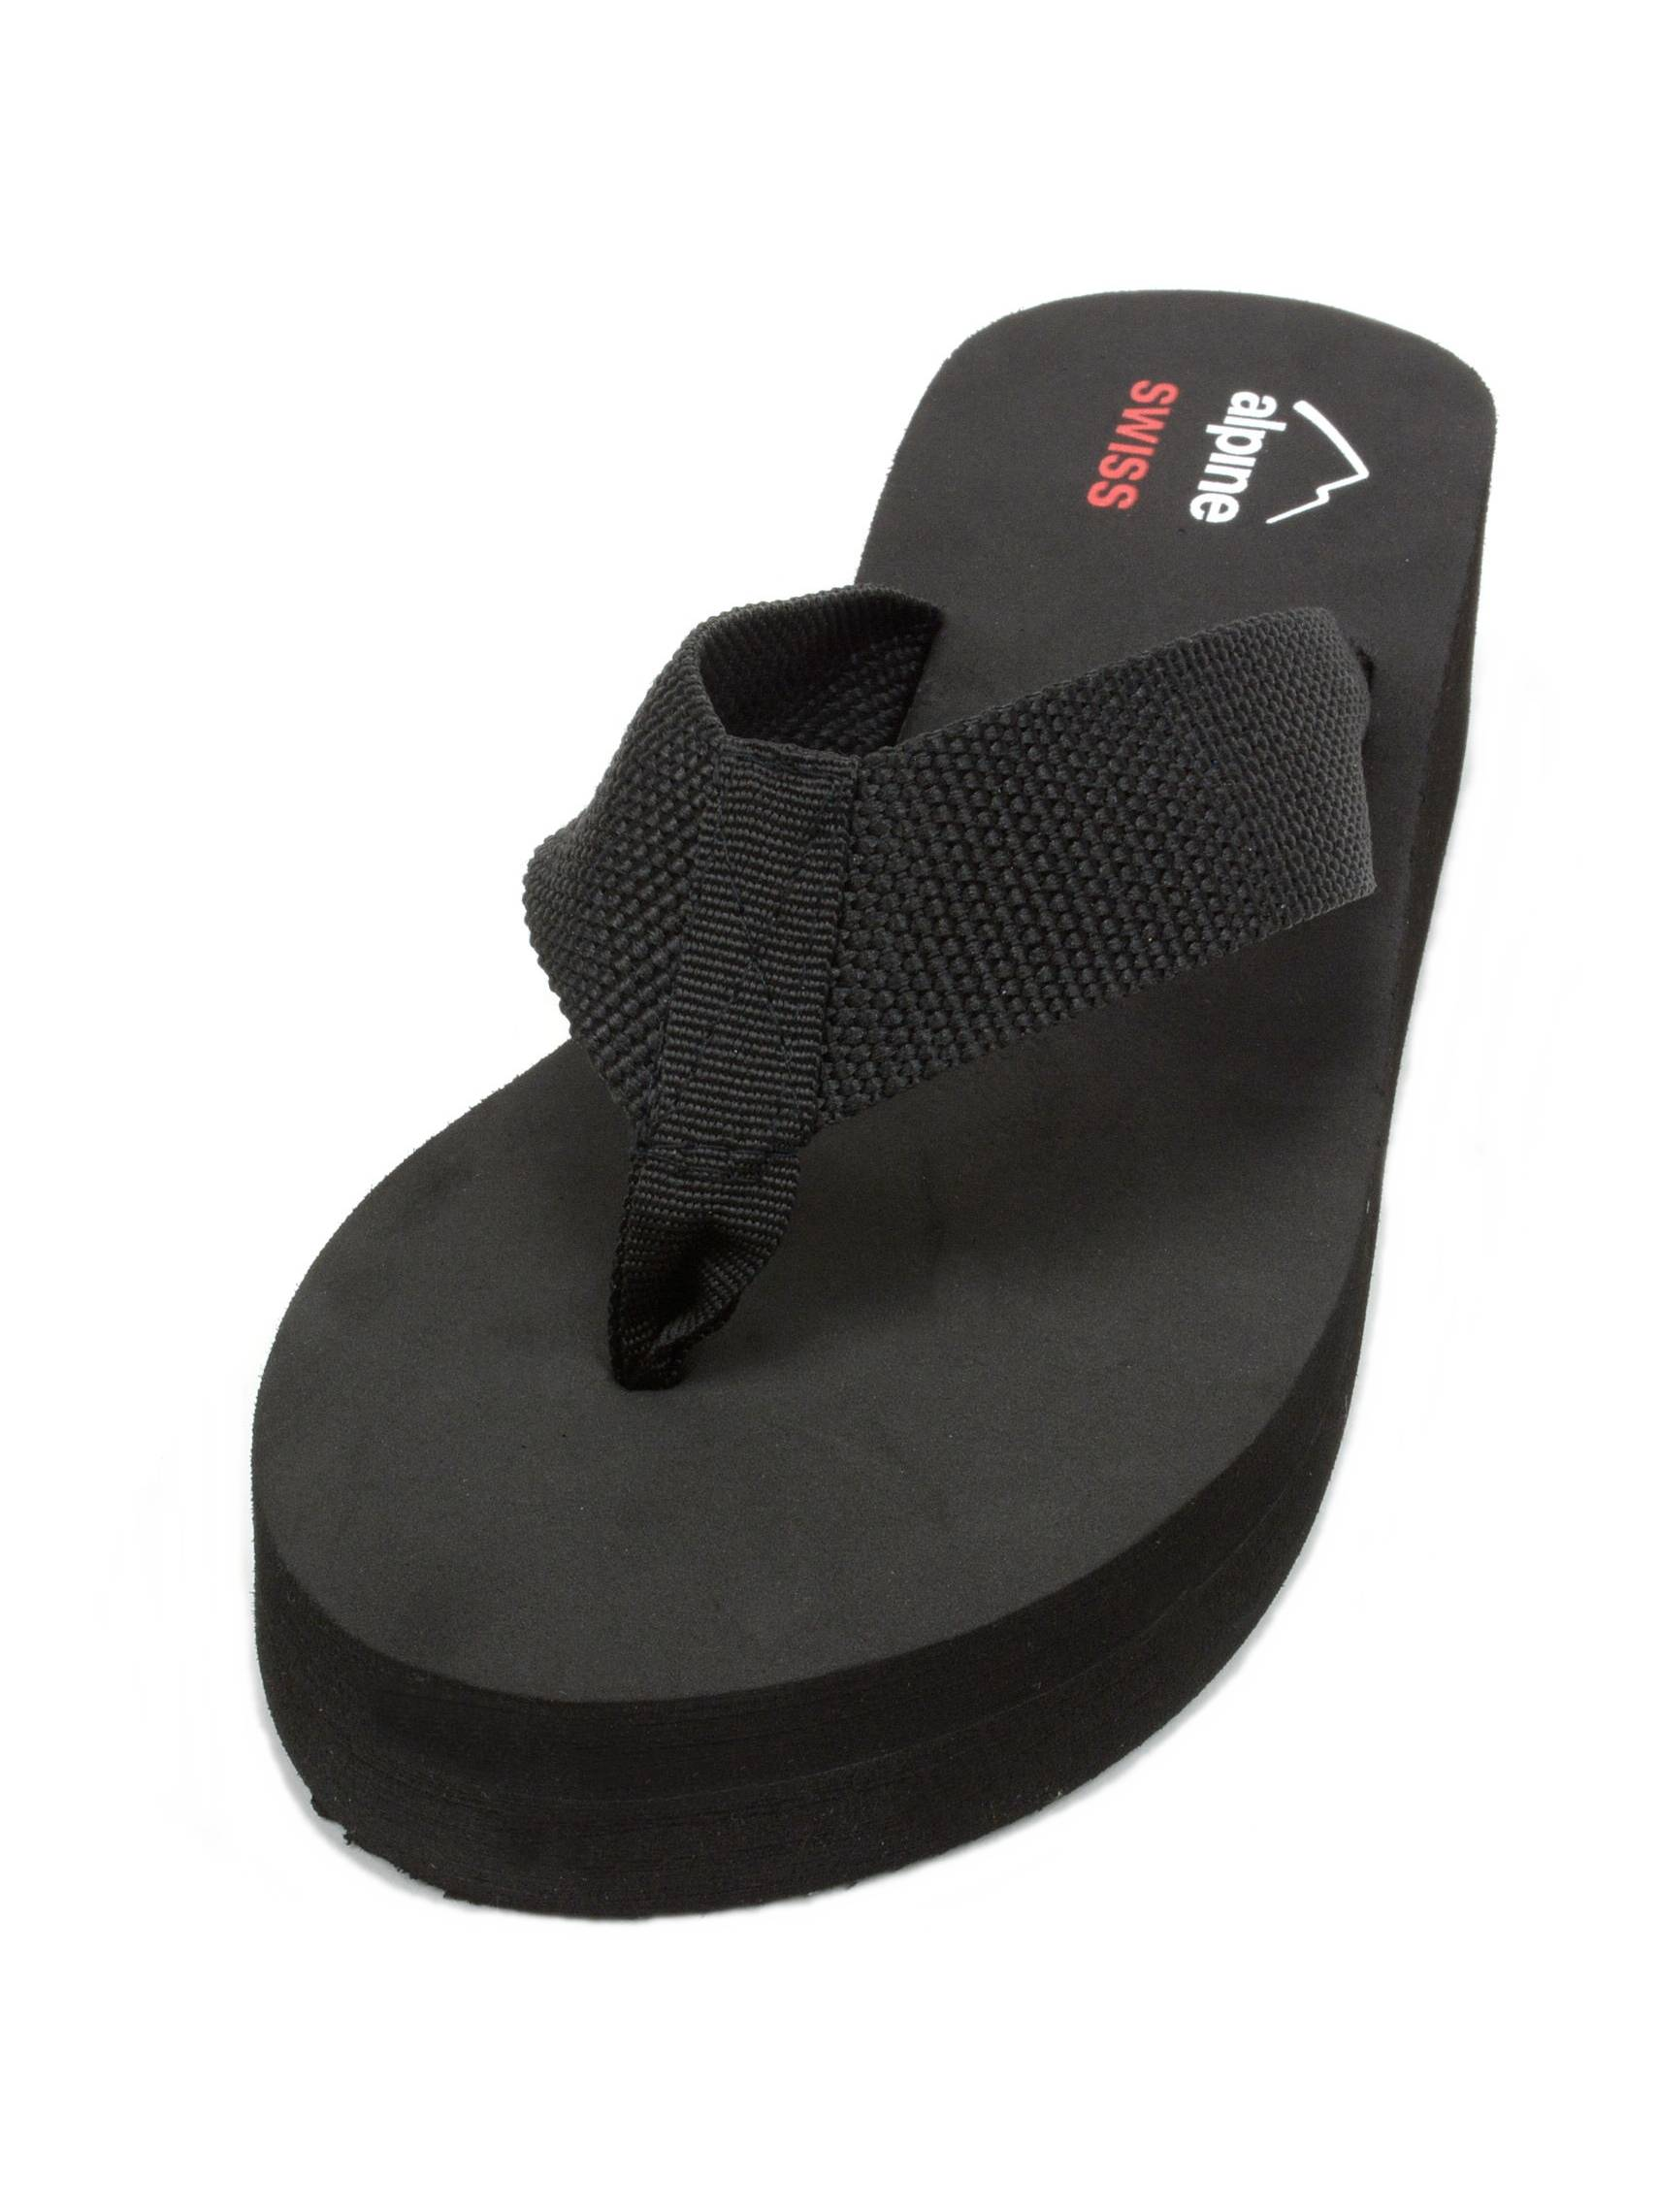 fc80d290df8e alpine swiss - Alpine Swiss Womens Flip Flops Thong Sandals Rhinestone  Wedge High Heel Platform - Walmart.com